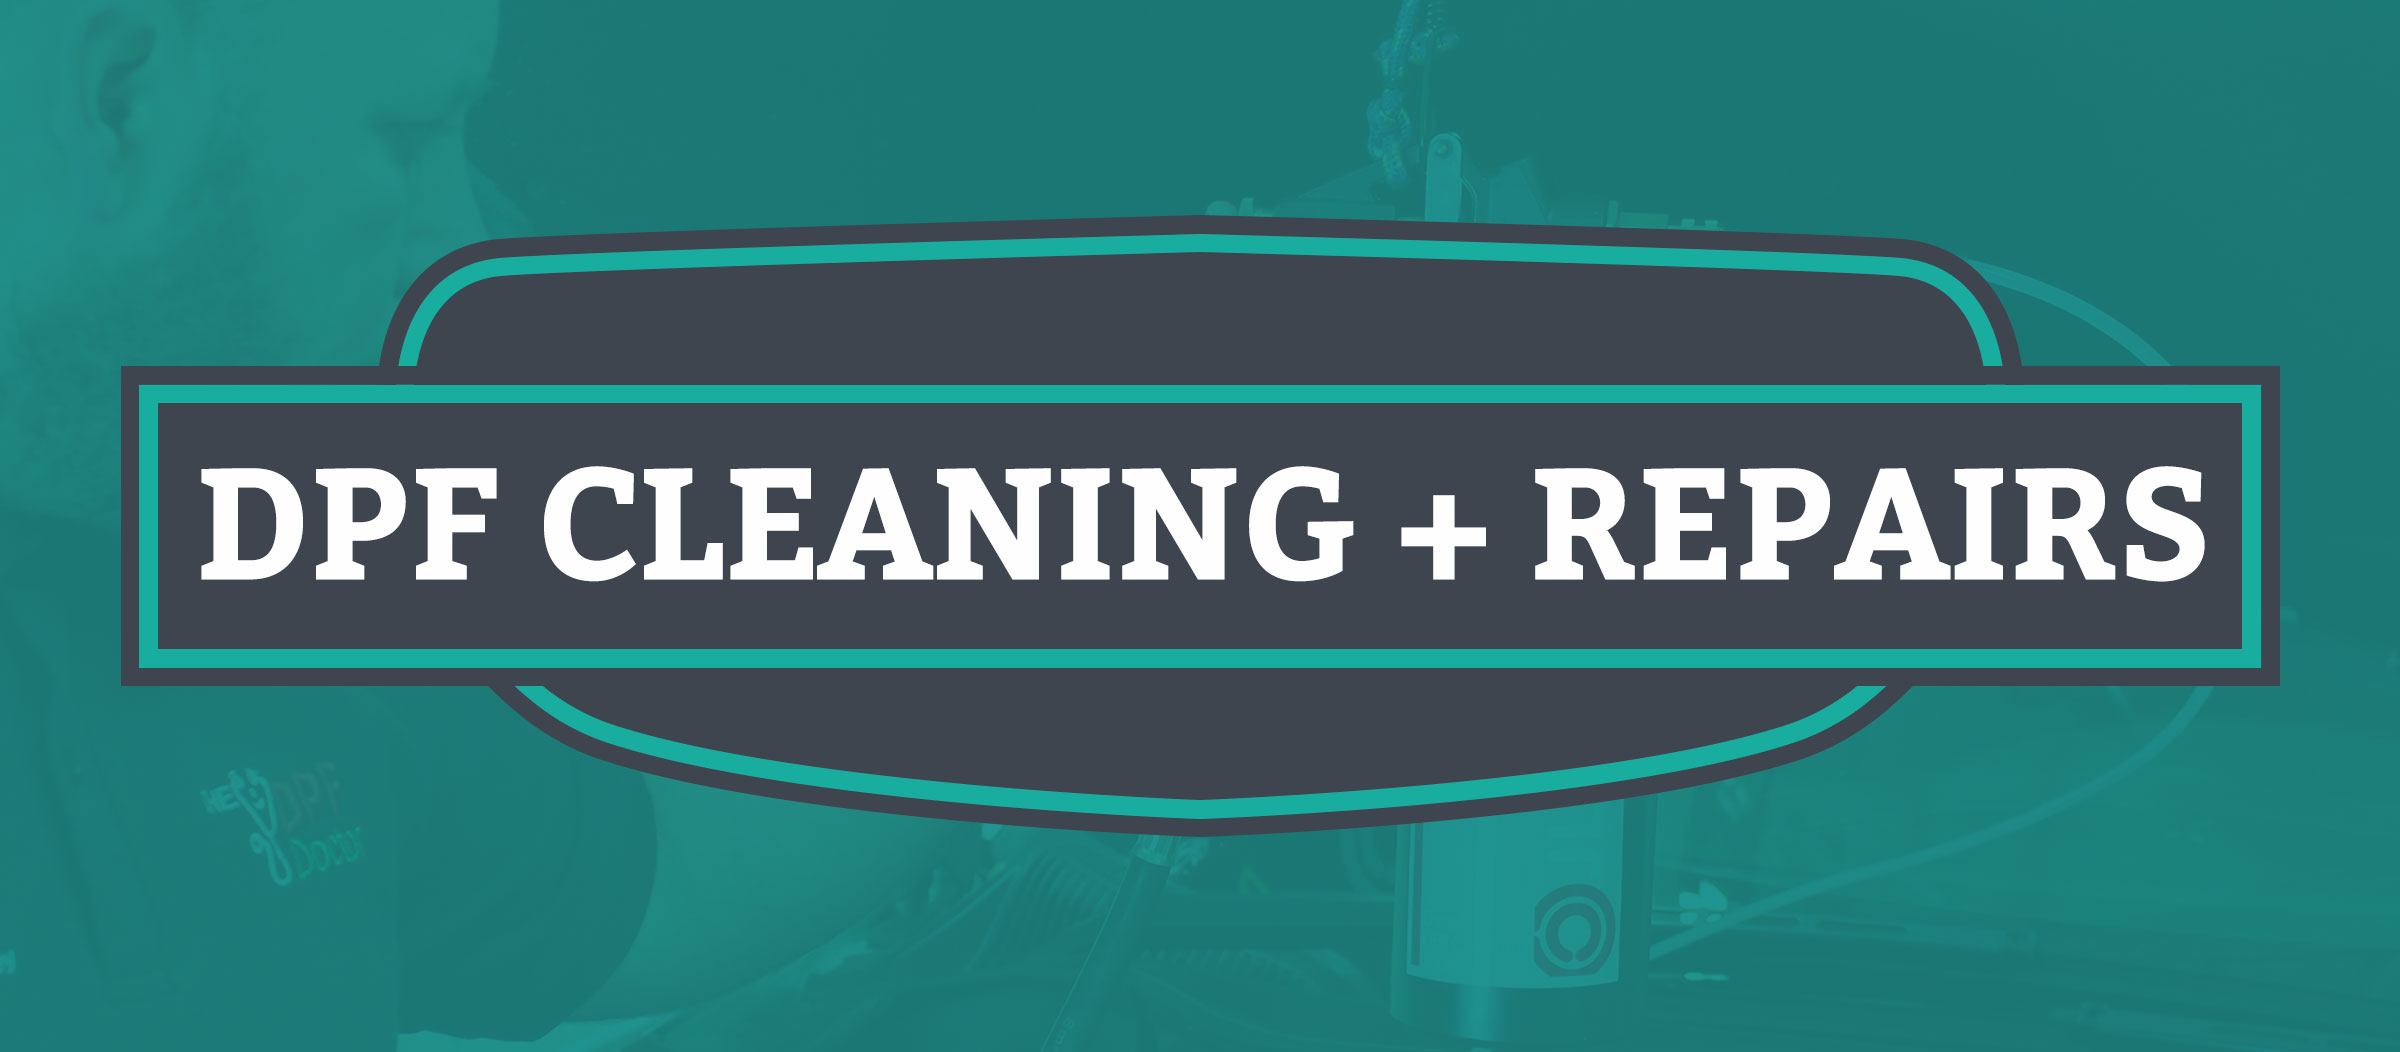 DPF Cleaning Warrington